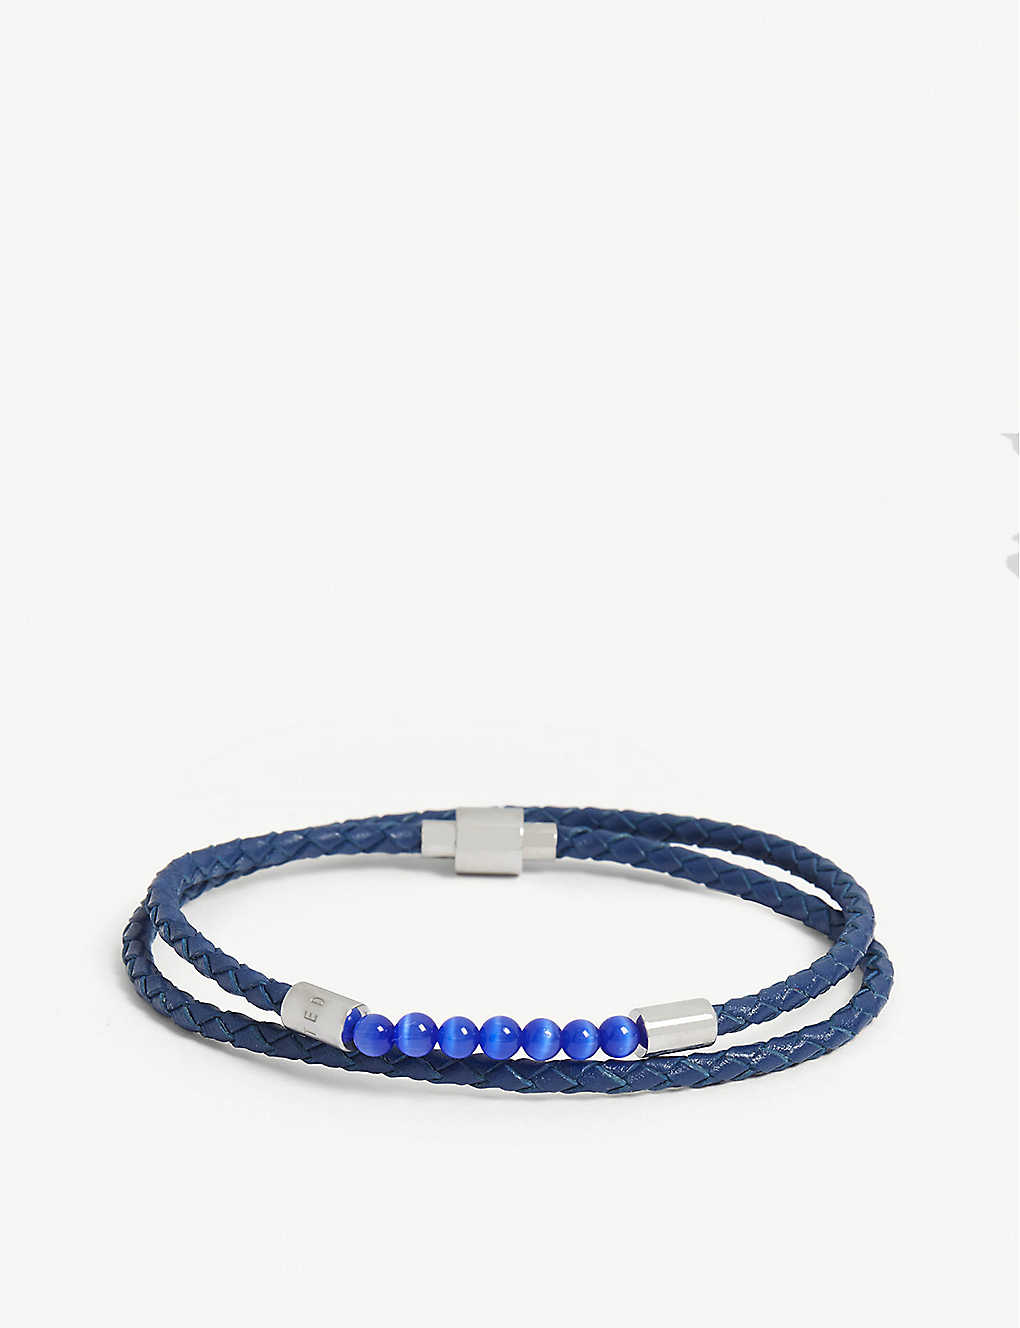 46f1569d5e8a TED BAKER - Beeder leather wrap bracelet